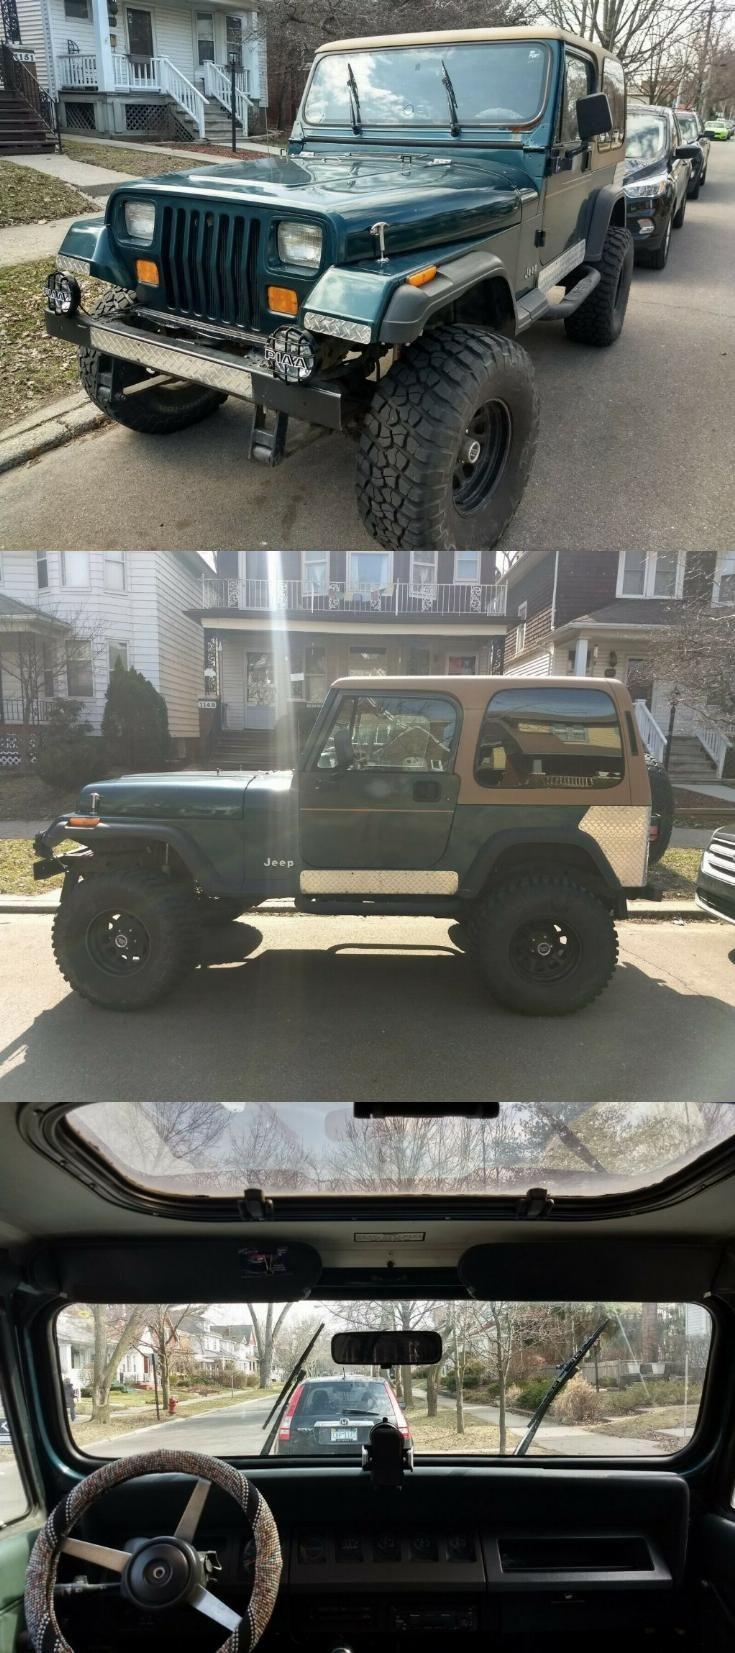 1995 Jeep Wrangler Yj Jeep Wrangler Yj Jeep Yj Jeep